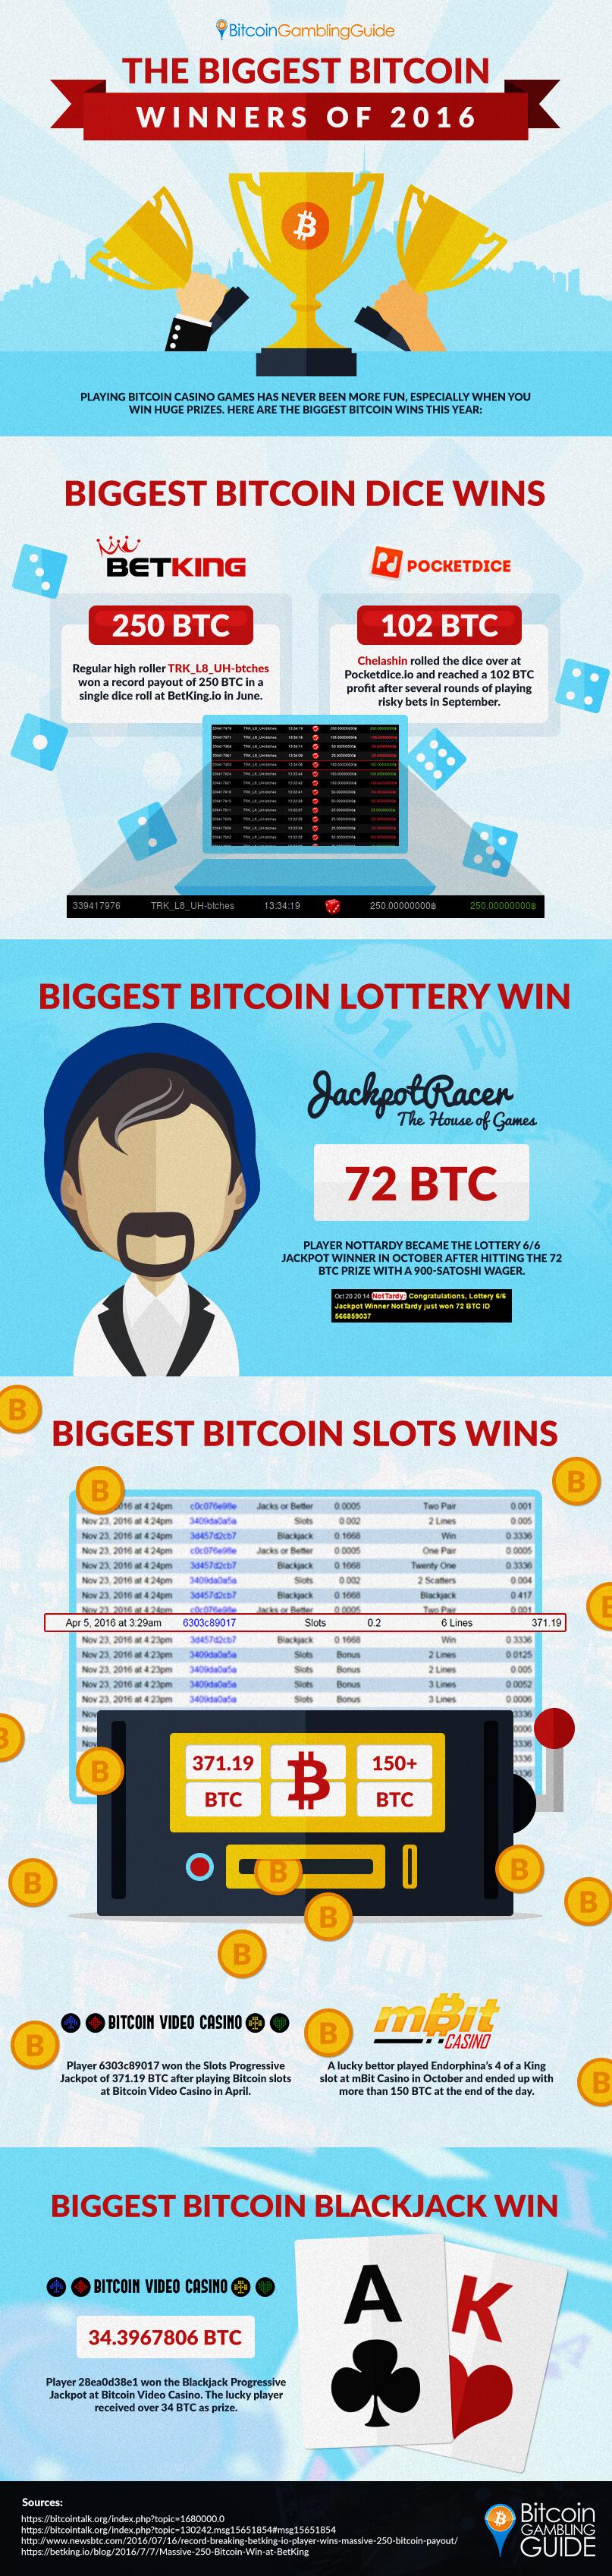 Biggest Bitcoin Winners of 2016